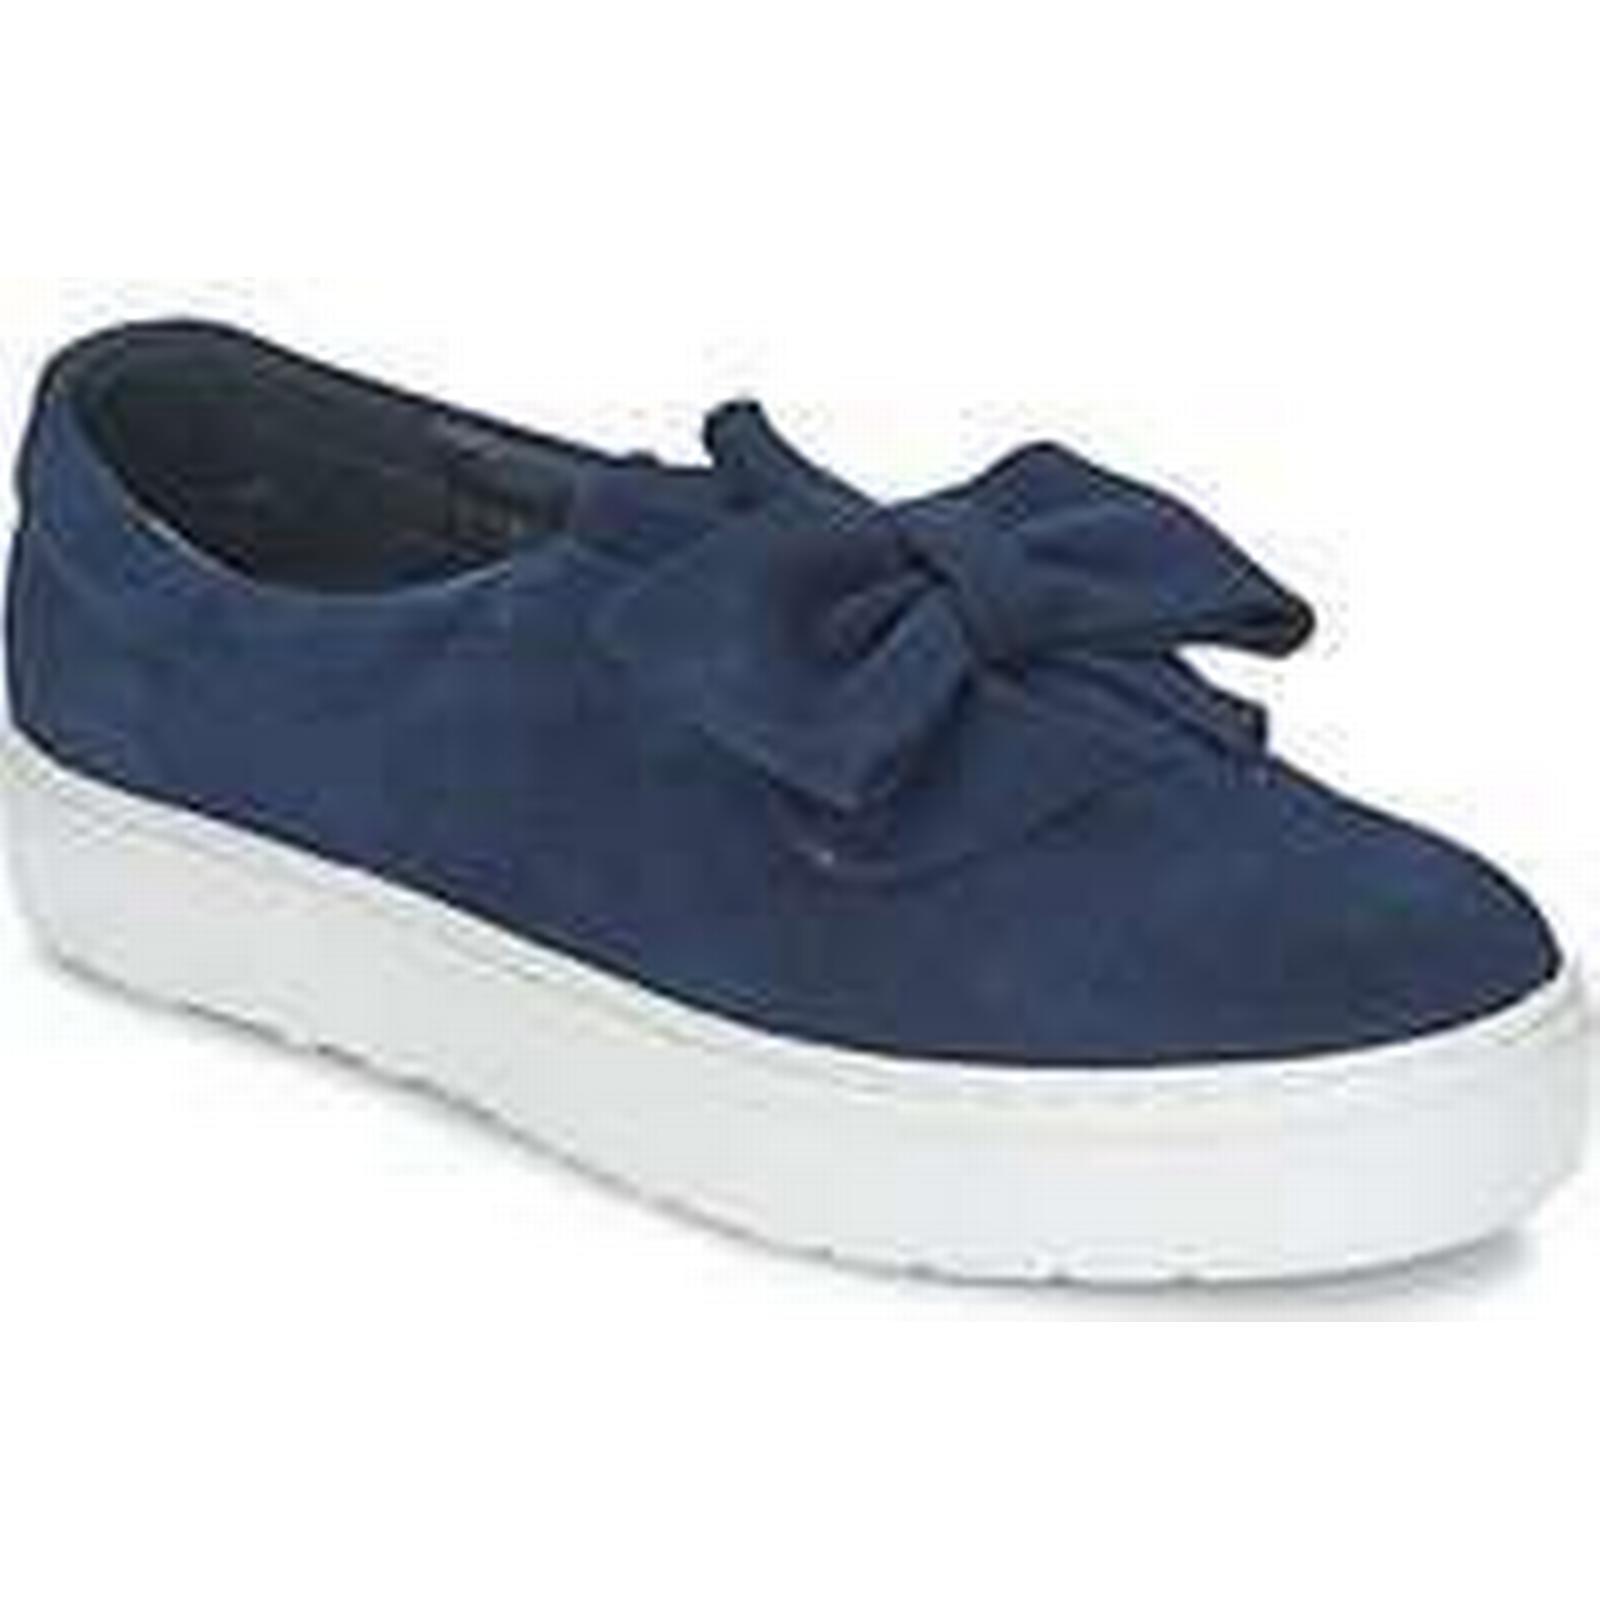 Spartoo.co.uk Slip-ons F-Troupe Bow Vulc women's Slip-ons Spartoo.co.uk (Shoes) in Blue a9c16d